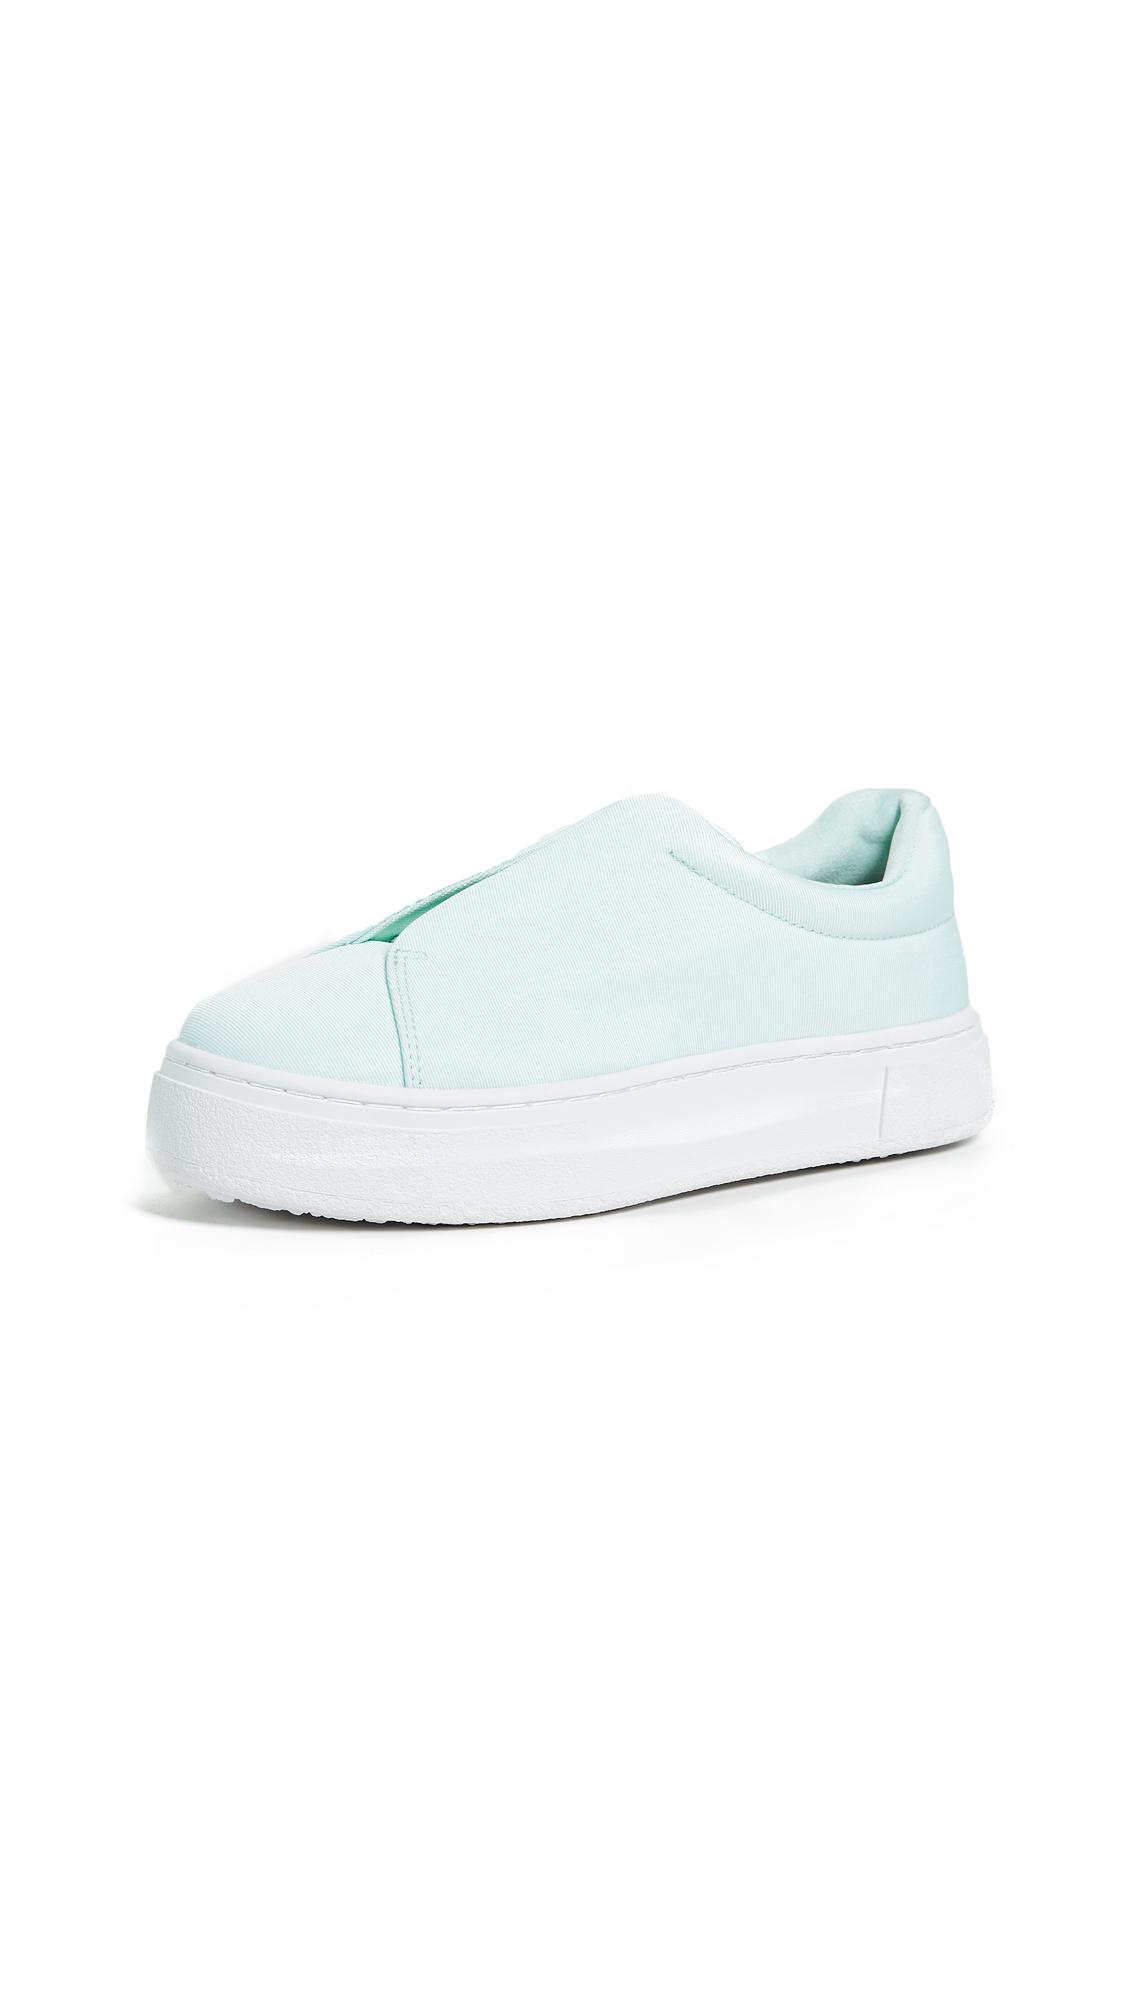 Eytys Doja S-O Sneakers - Aqua